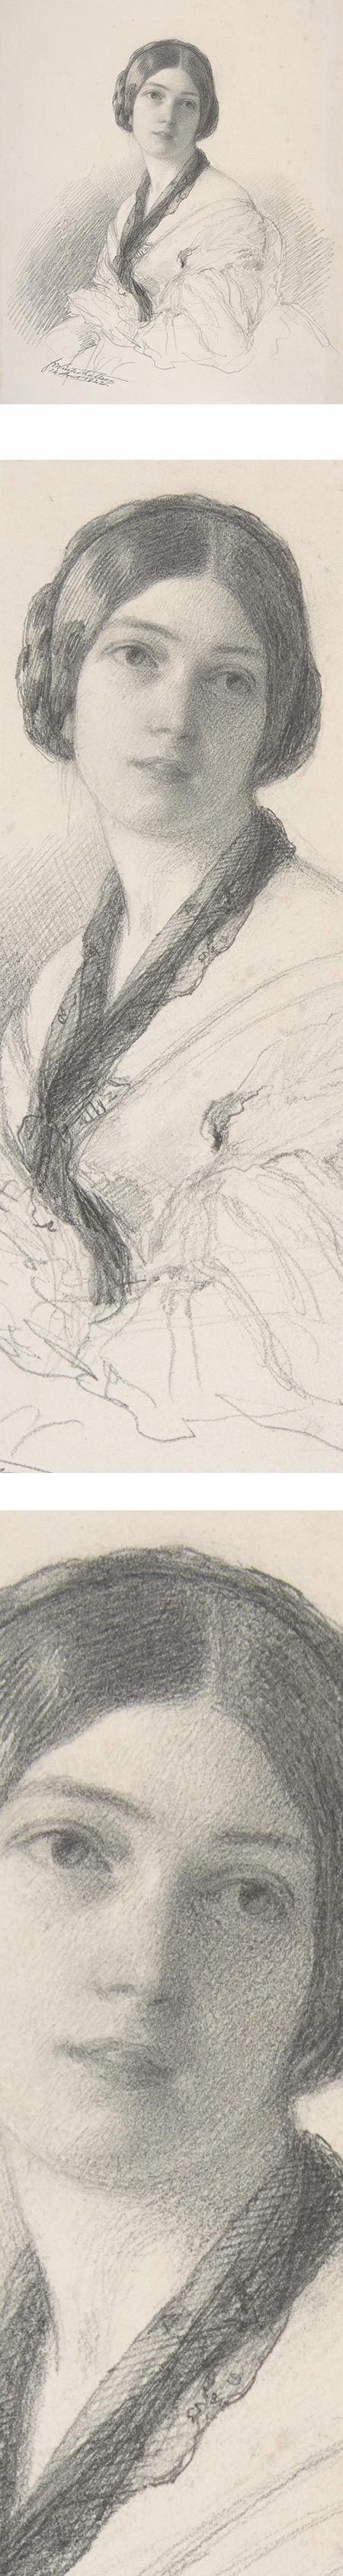 Eye Candy for Today: Franz Xaver Winterhalter pencil portrait